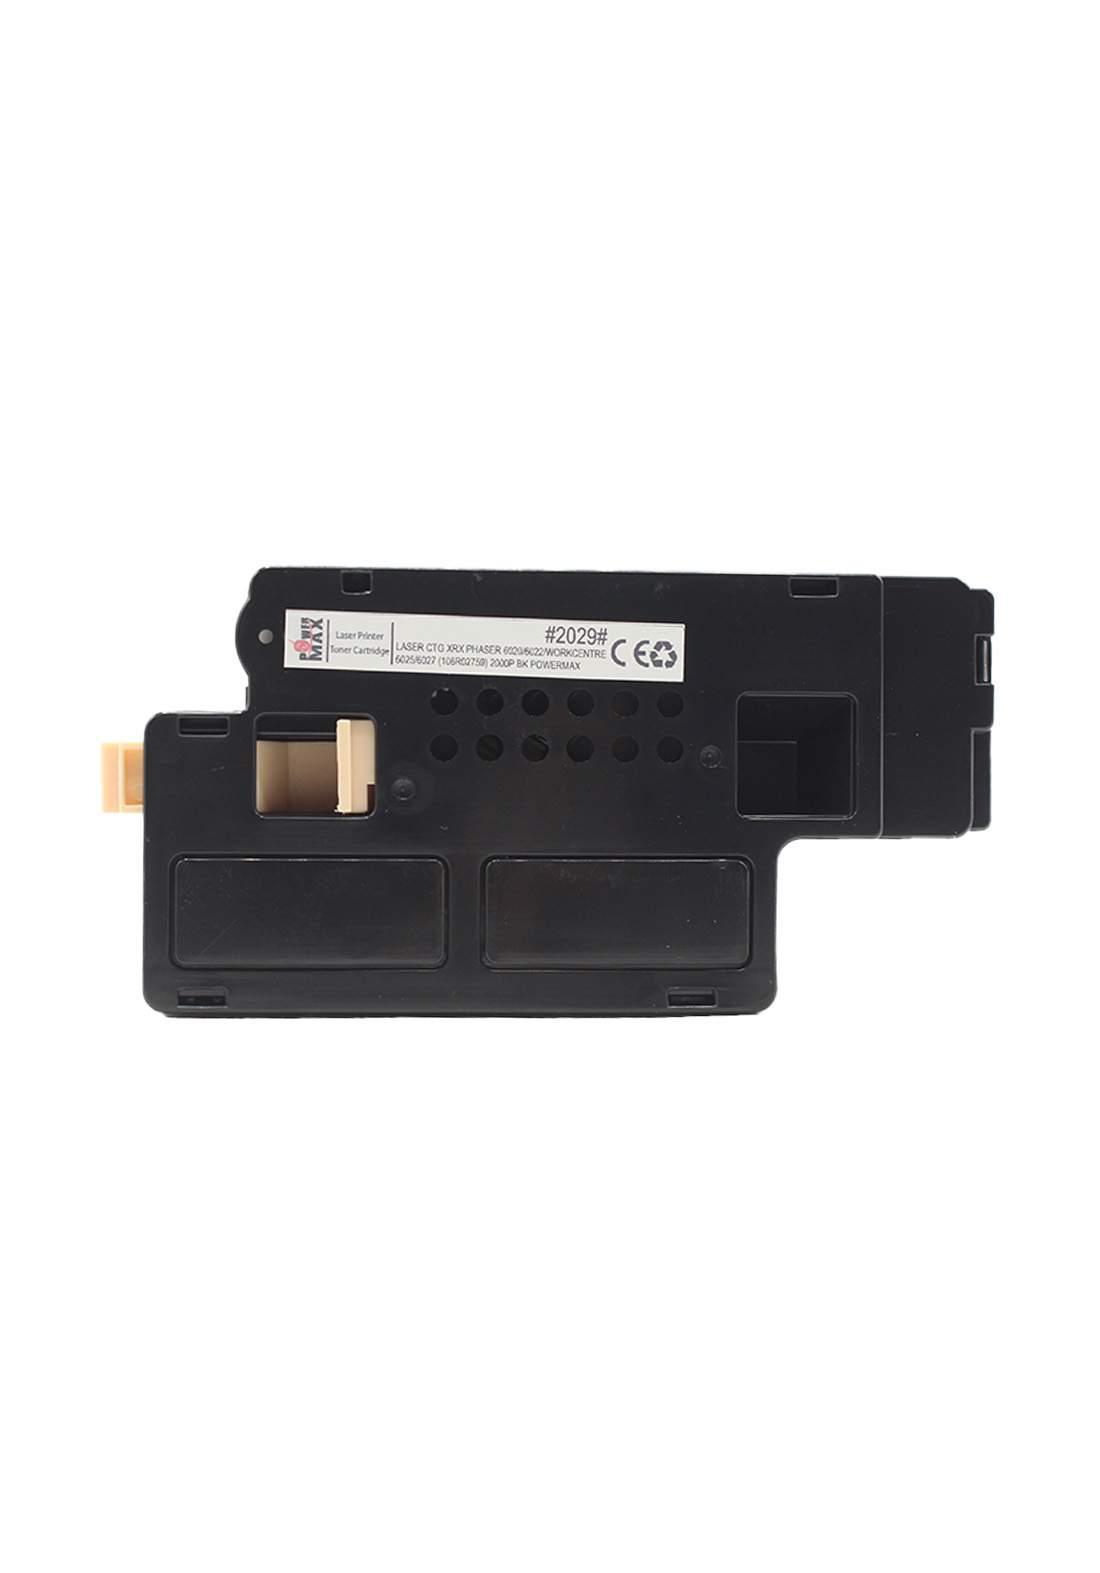 Power Max CTG Xerox Phaser 6020/6022/ Workcenter 6025/6027 (106R02759) 2000P Laser Printer Toner Cartridge خرطوشة حبر